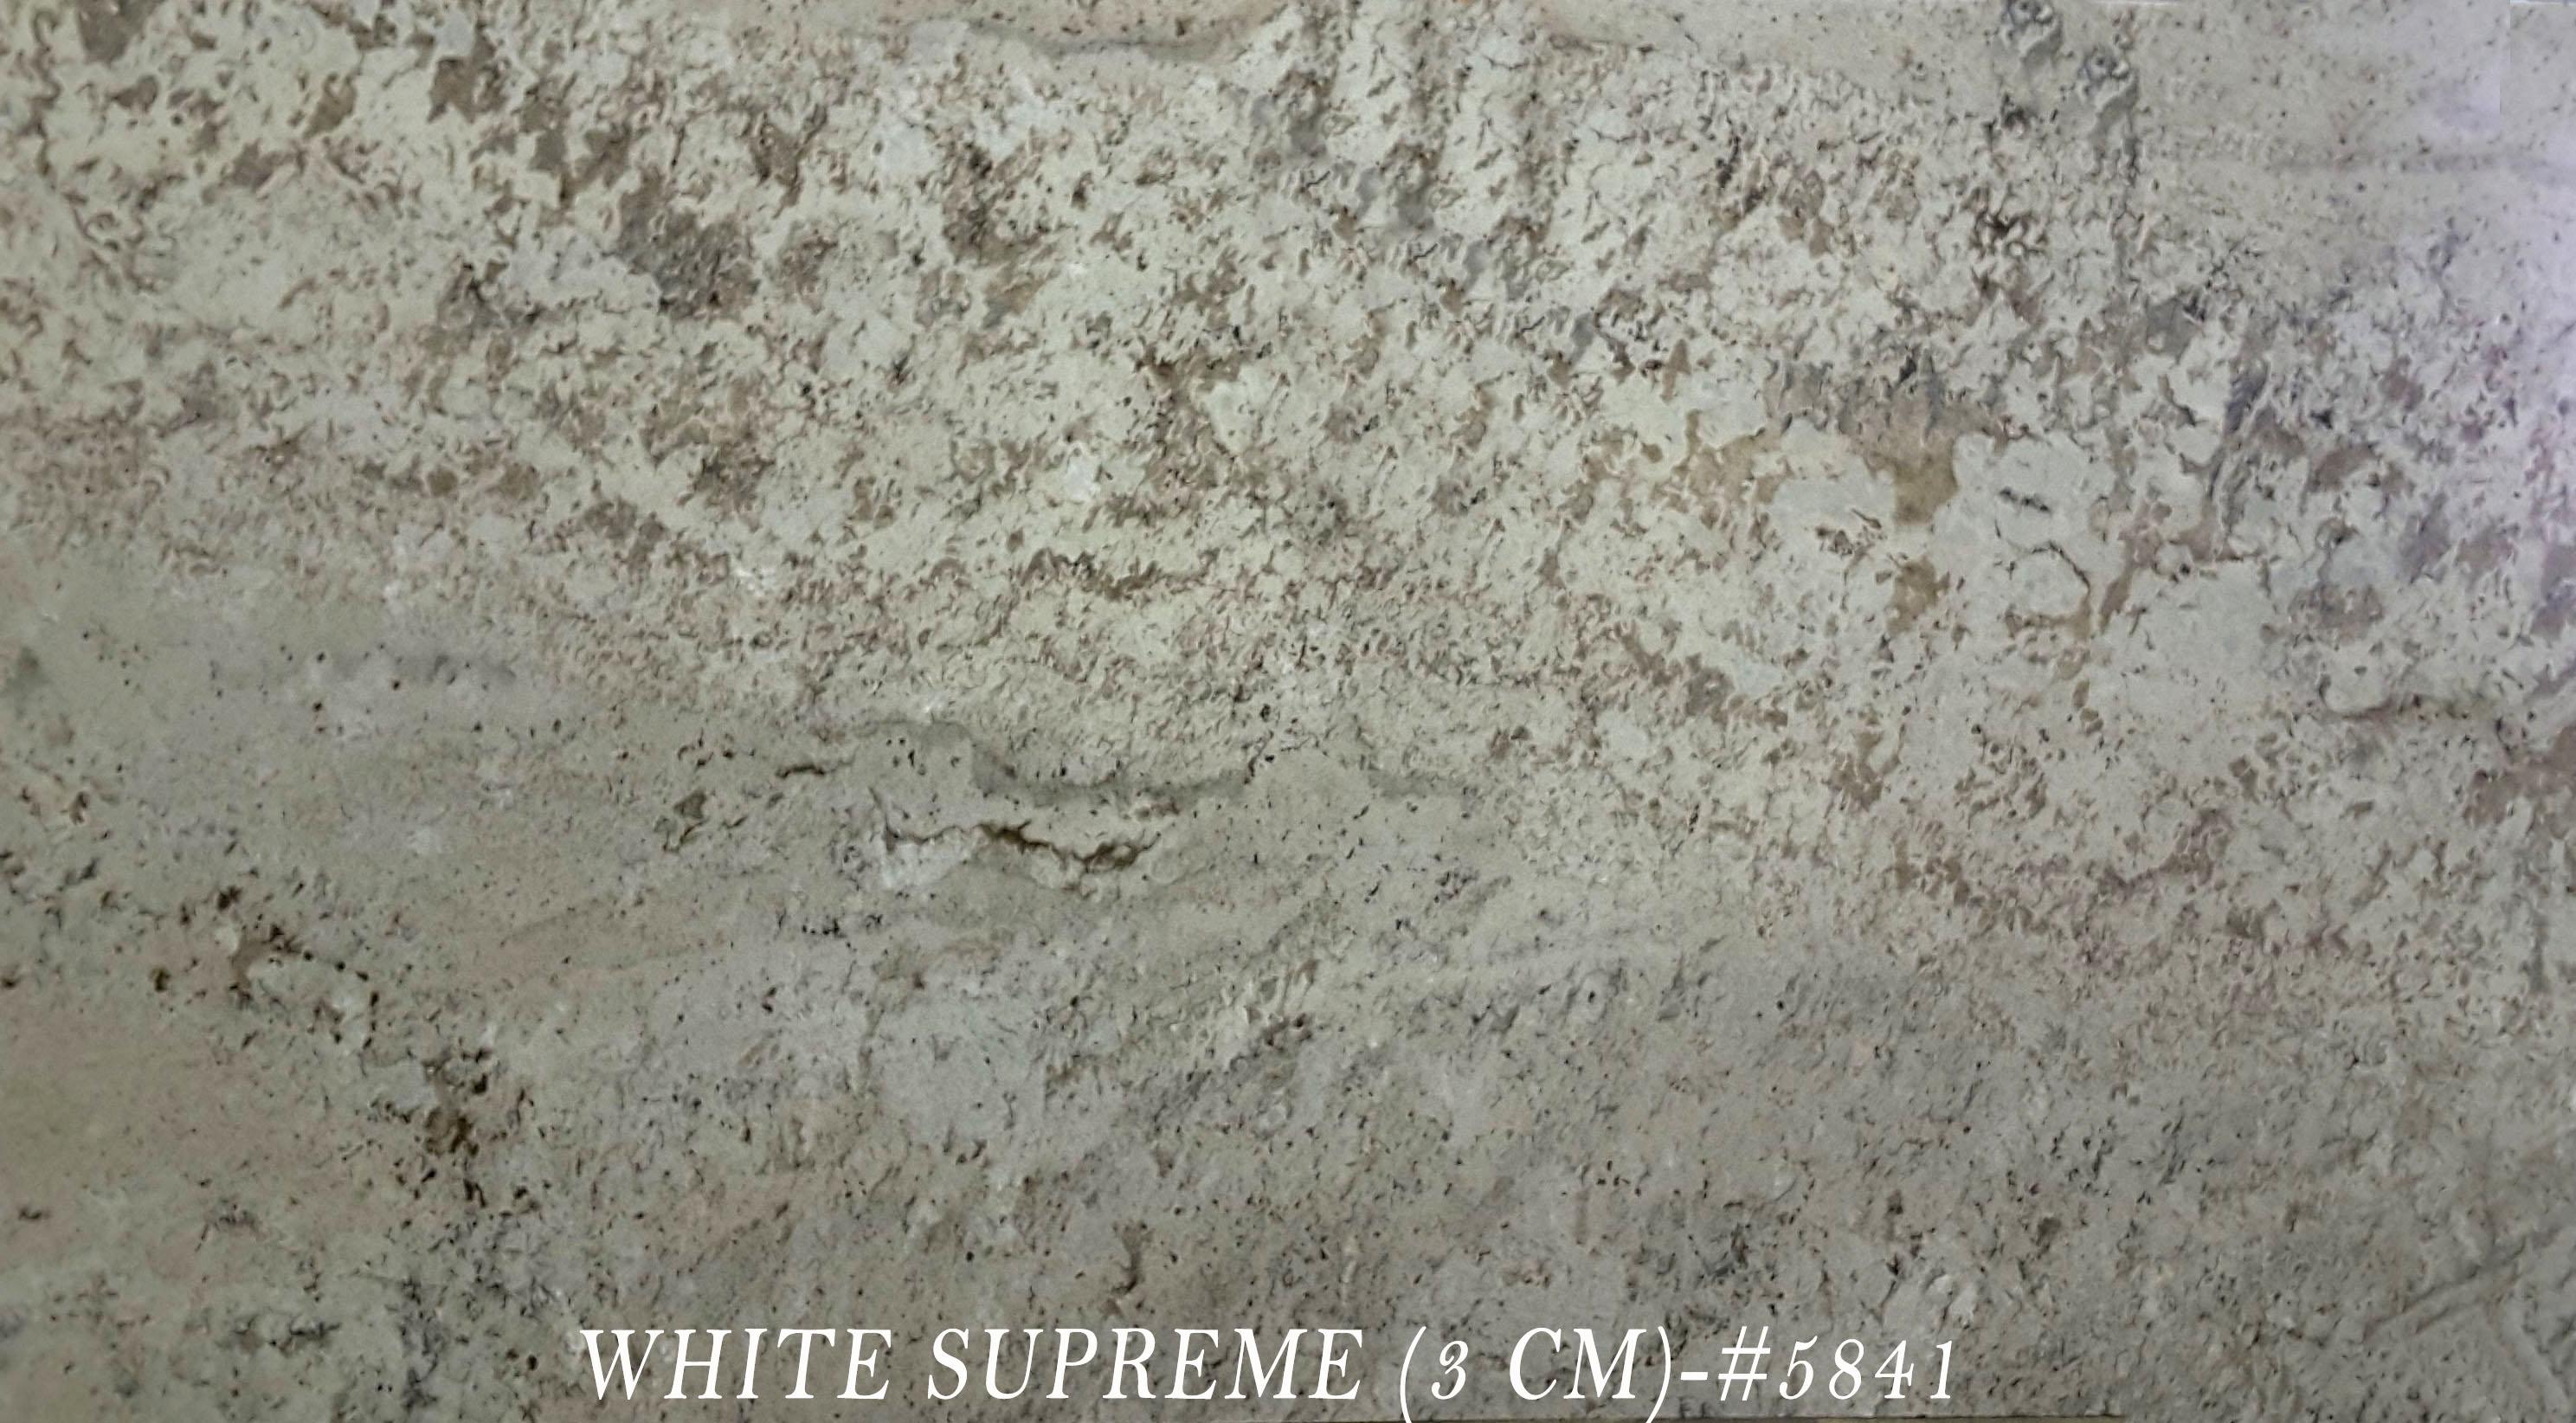 WHITE SUPREME (3 CM)-#5841